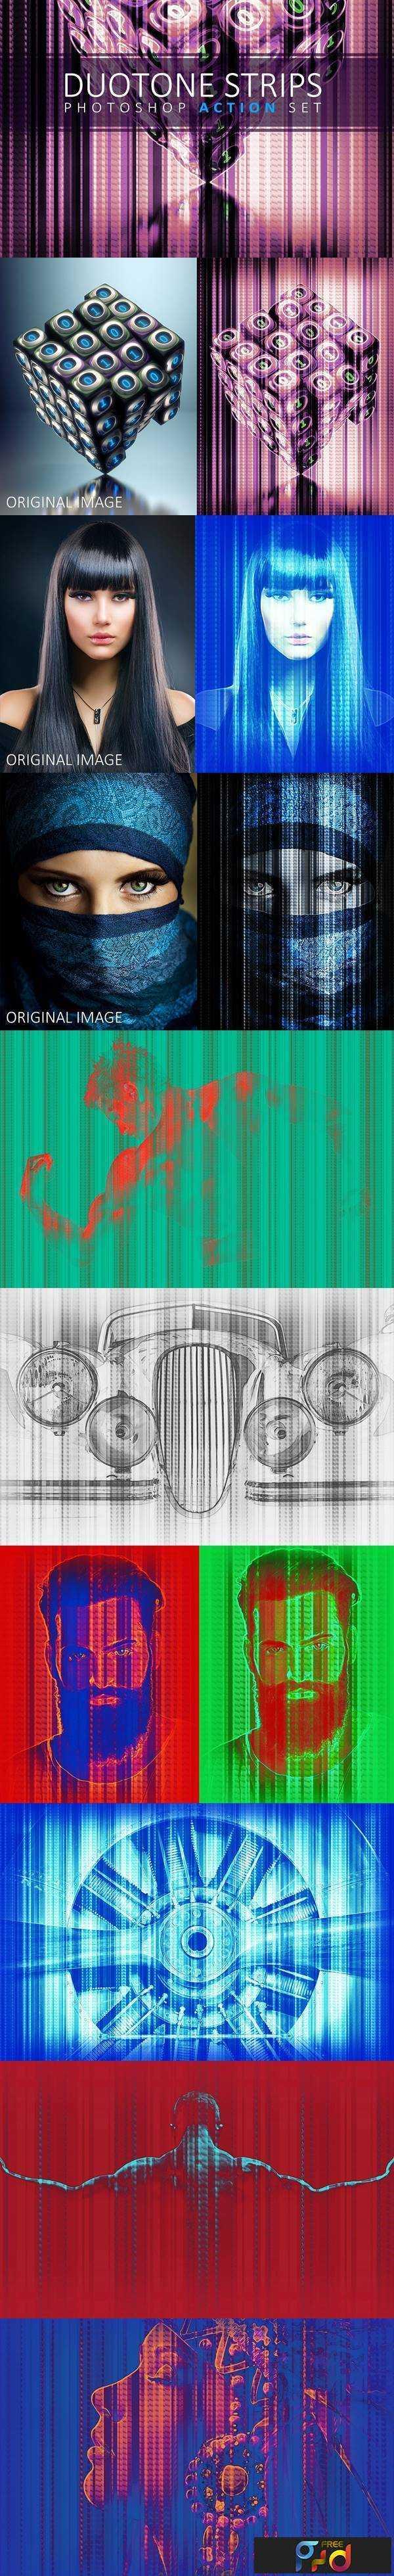 1806059 Duotone Strips Photoshop Action Set 2459110 1